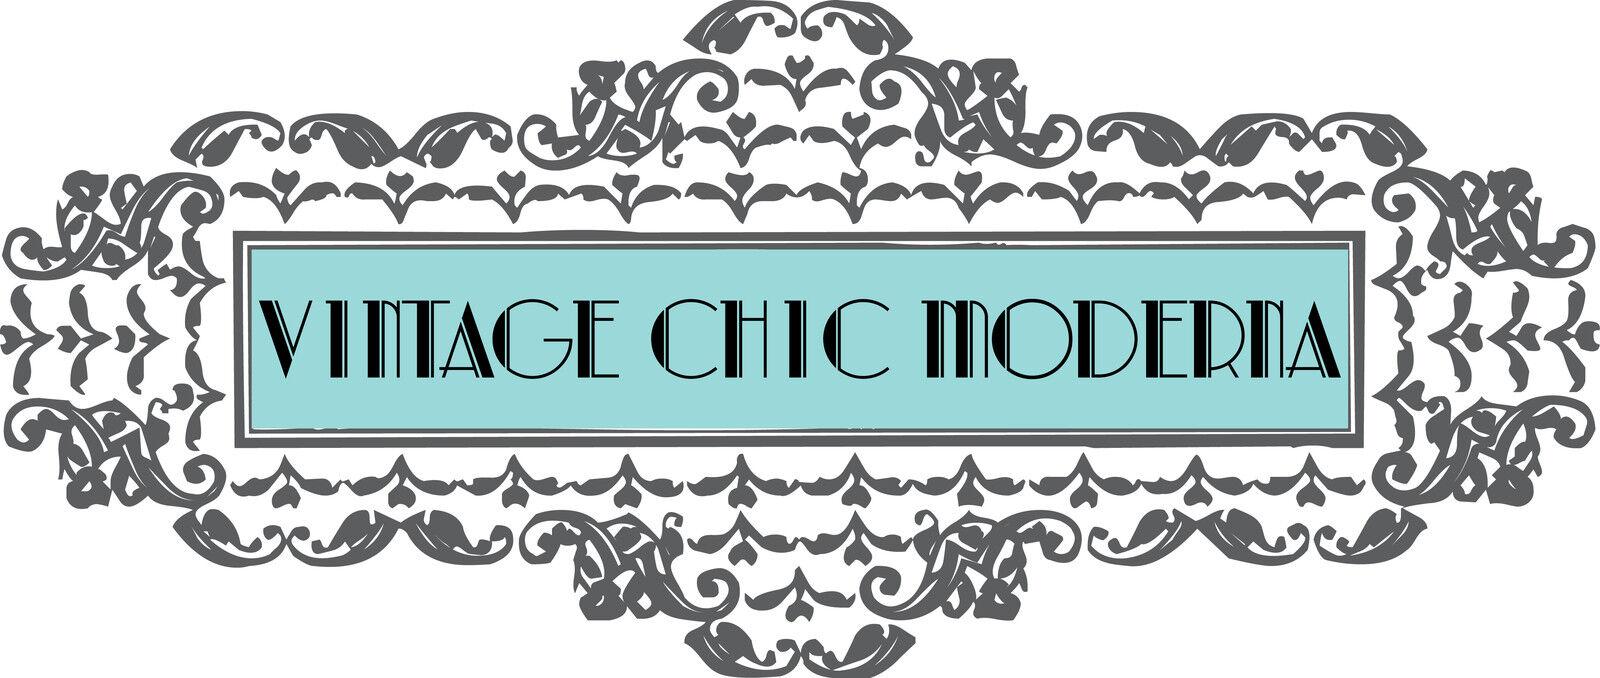 Vintage Chic Moderna